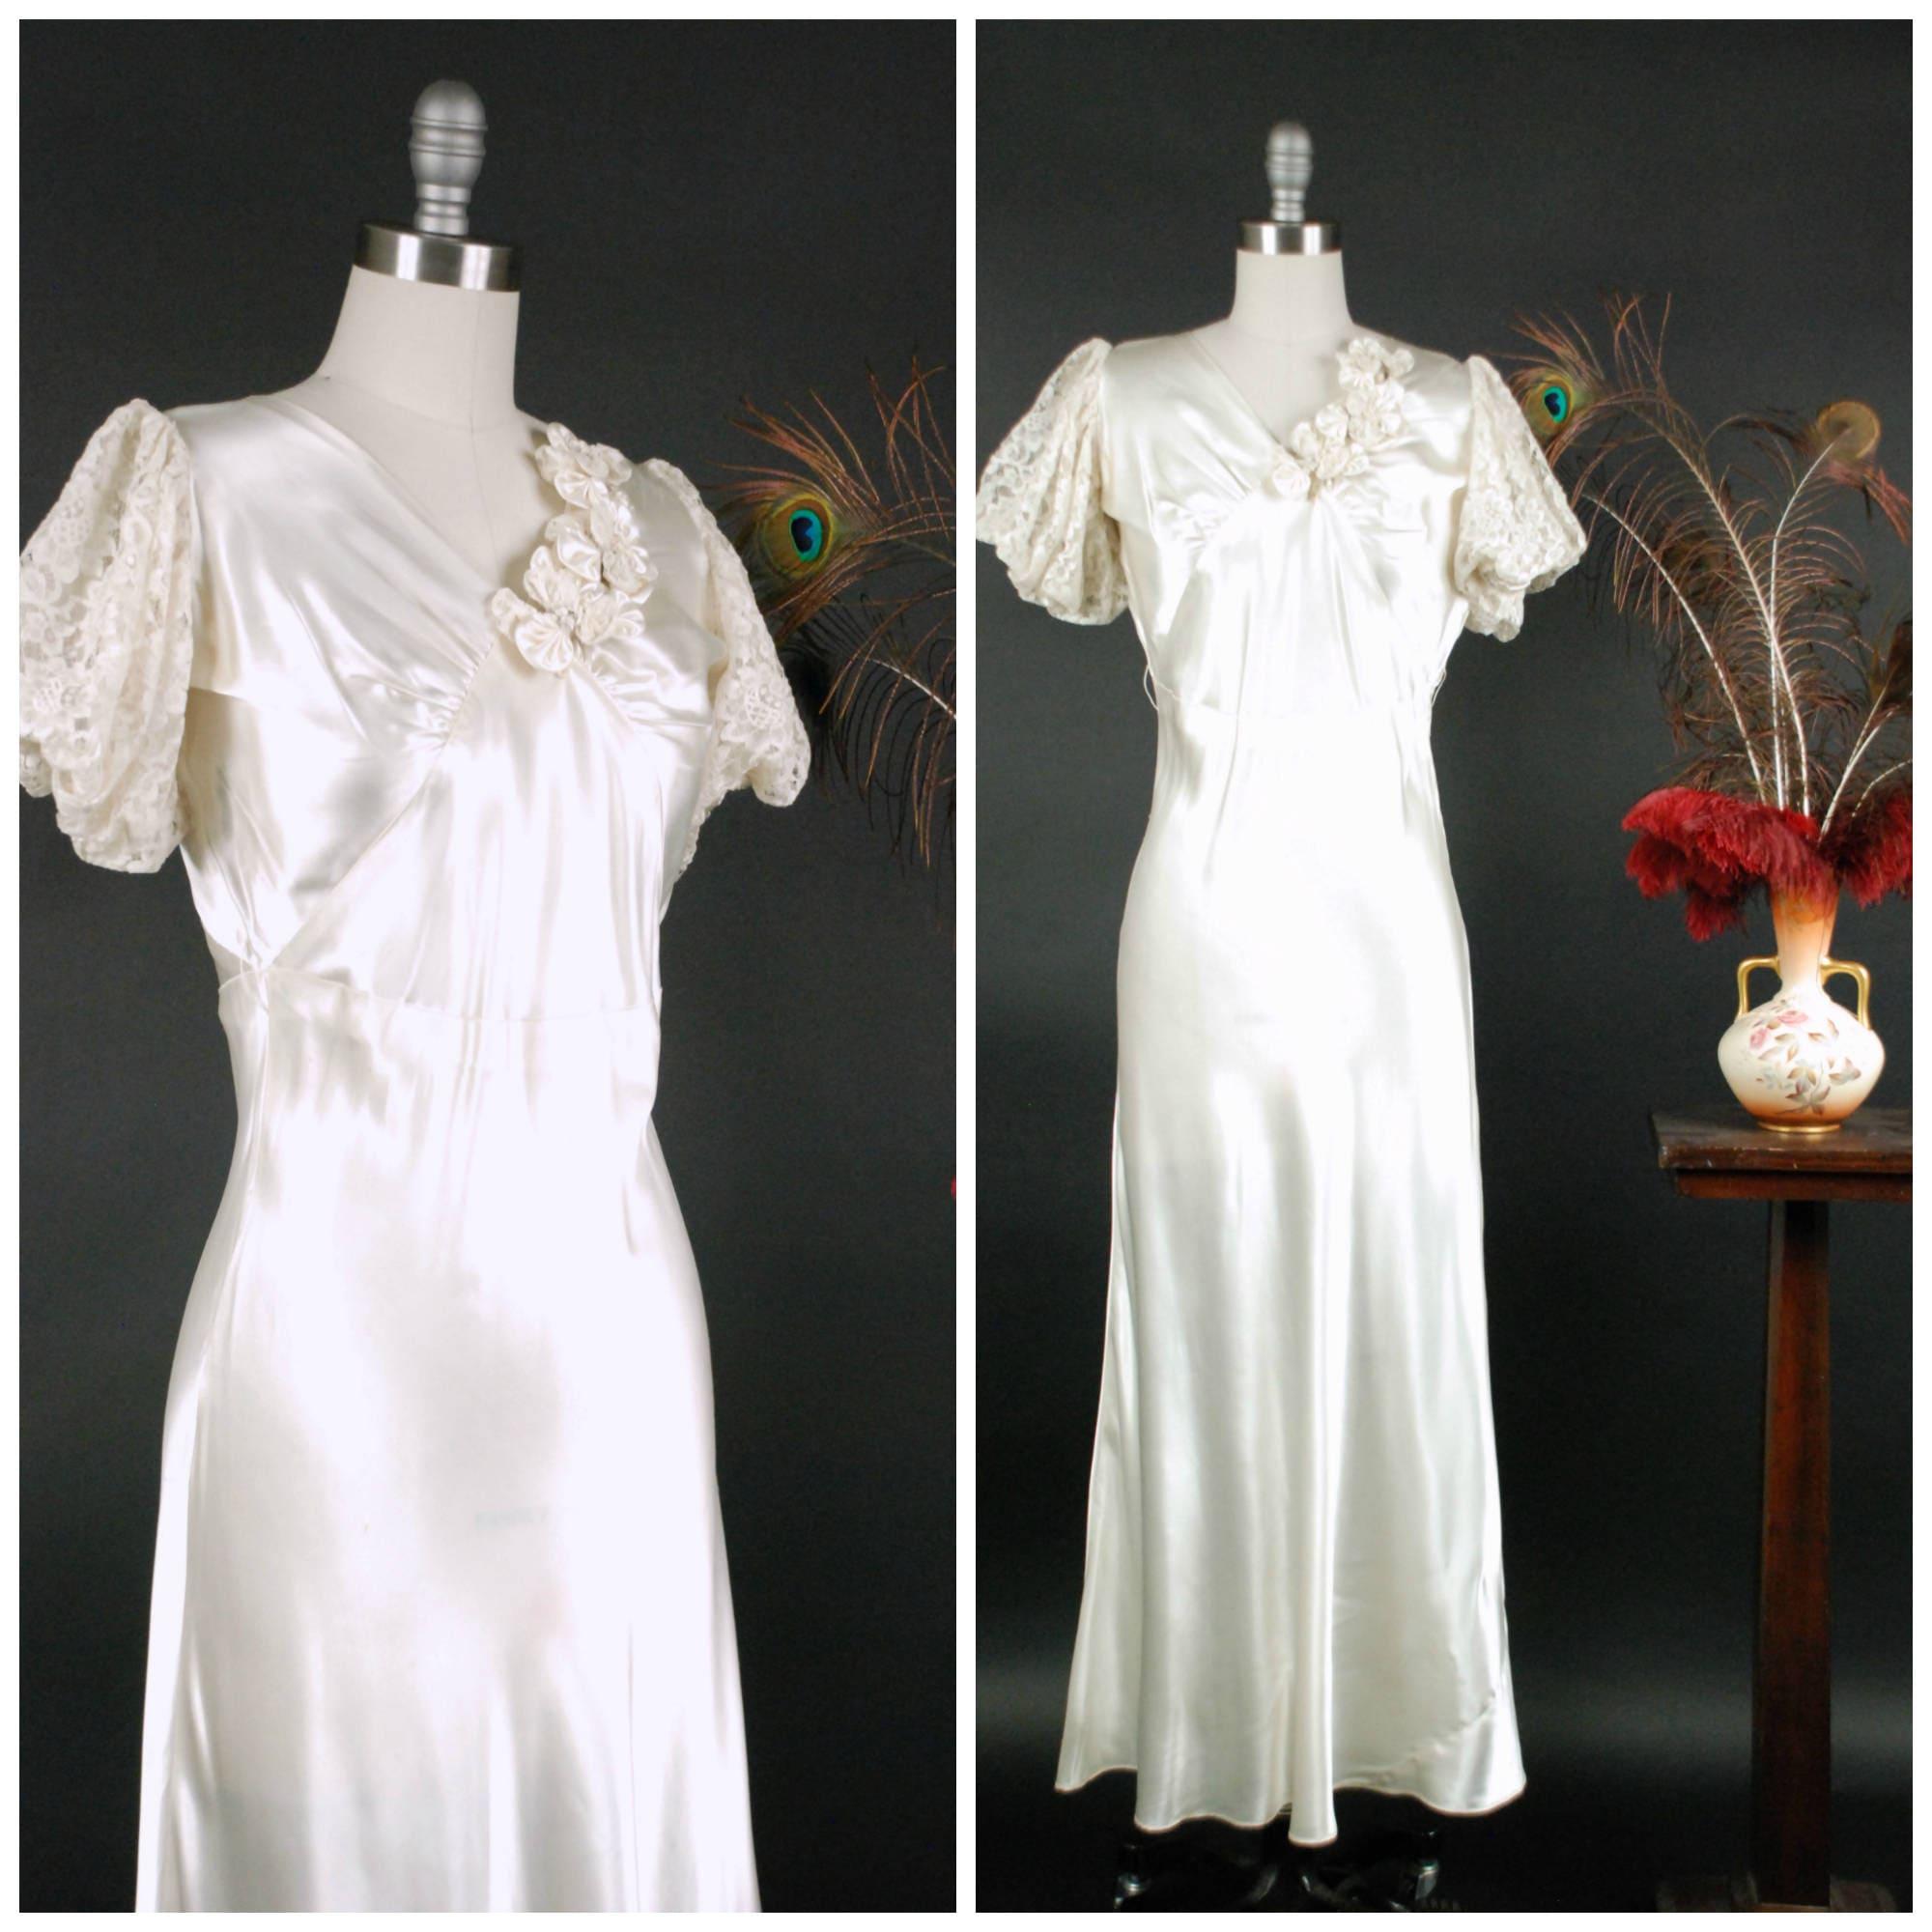 1930s Wedding Dresses: Vintage 1930s Wedding Dress A 1930s Satin Bias Cute Short